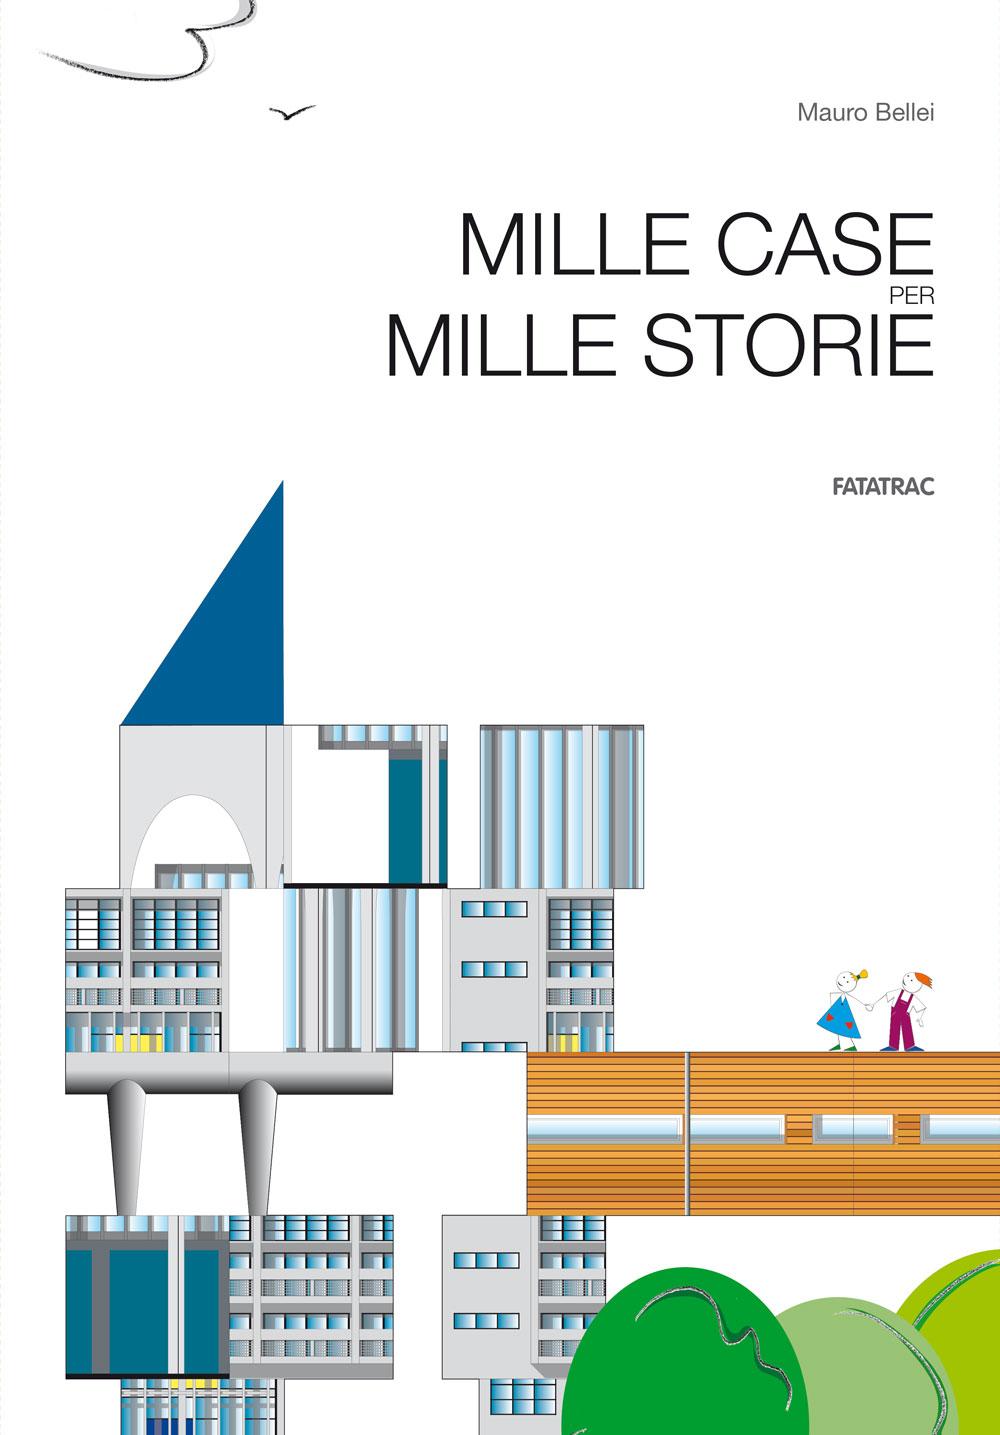 Mille case per mille storie